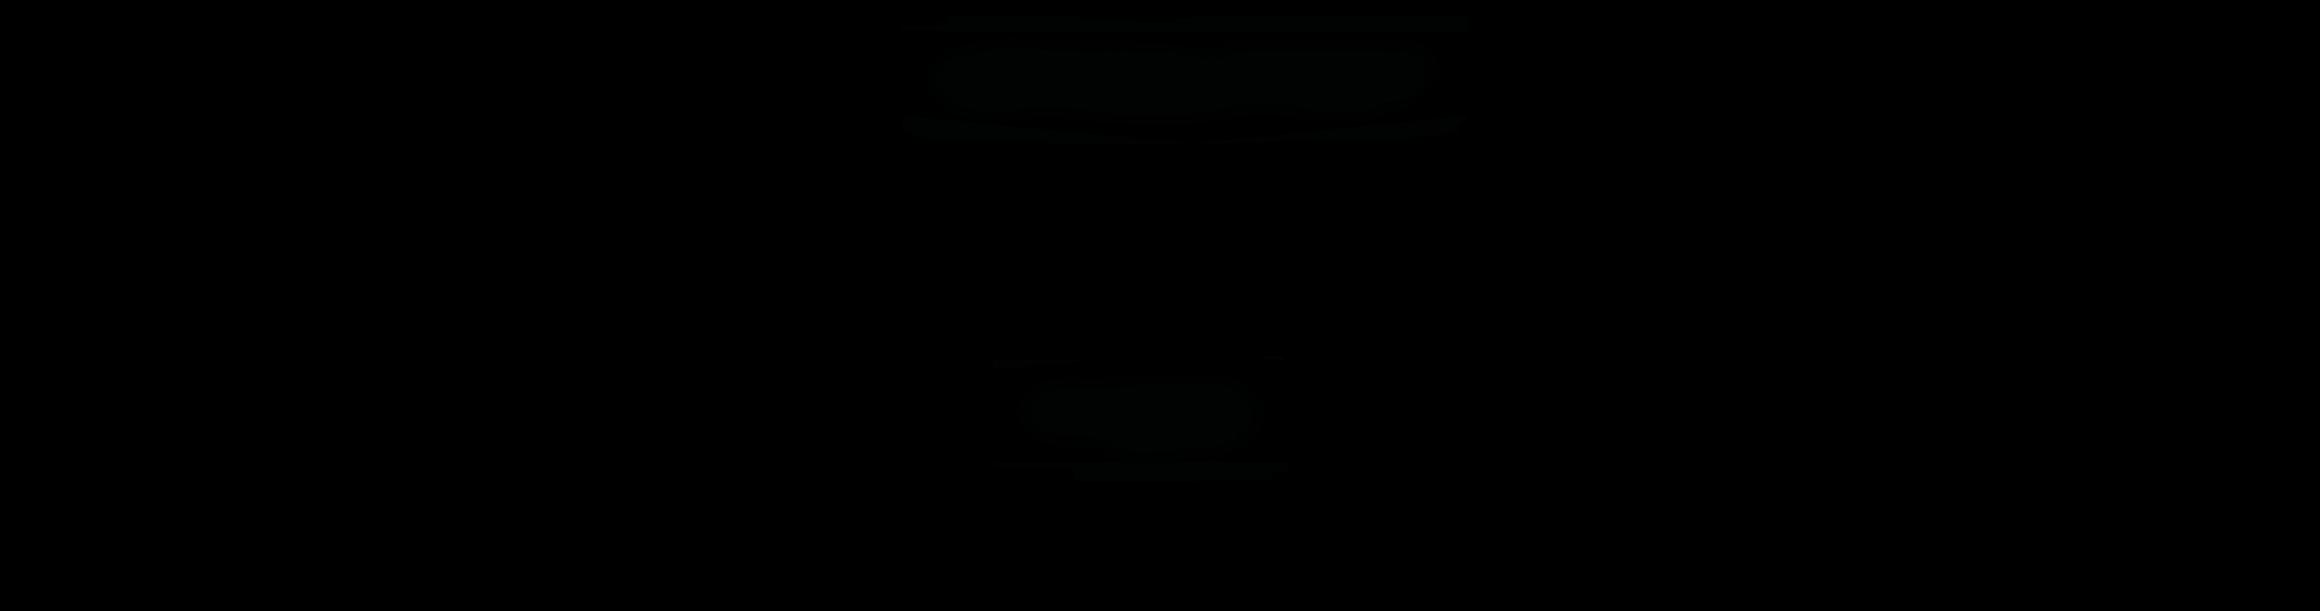 Pennington Title Company logo